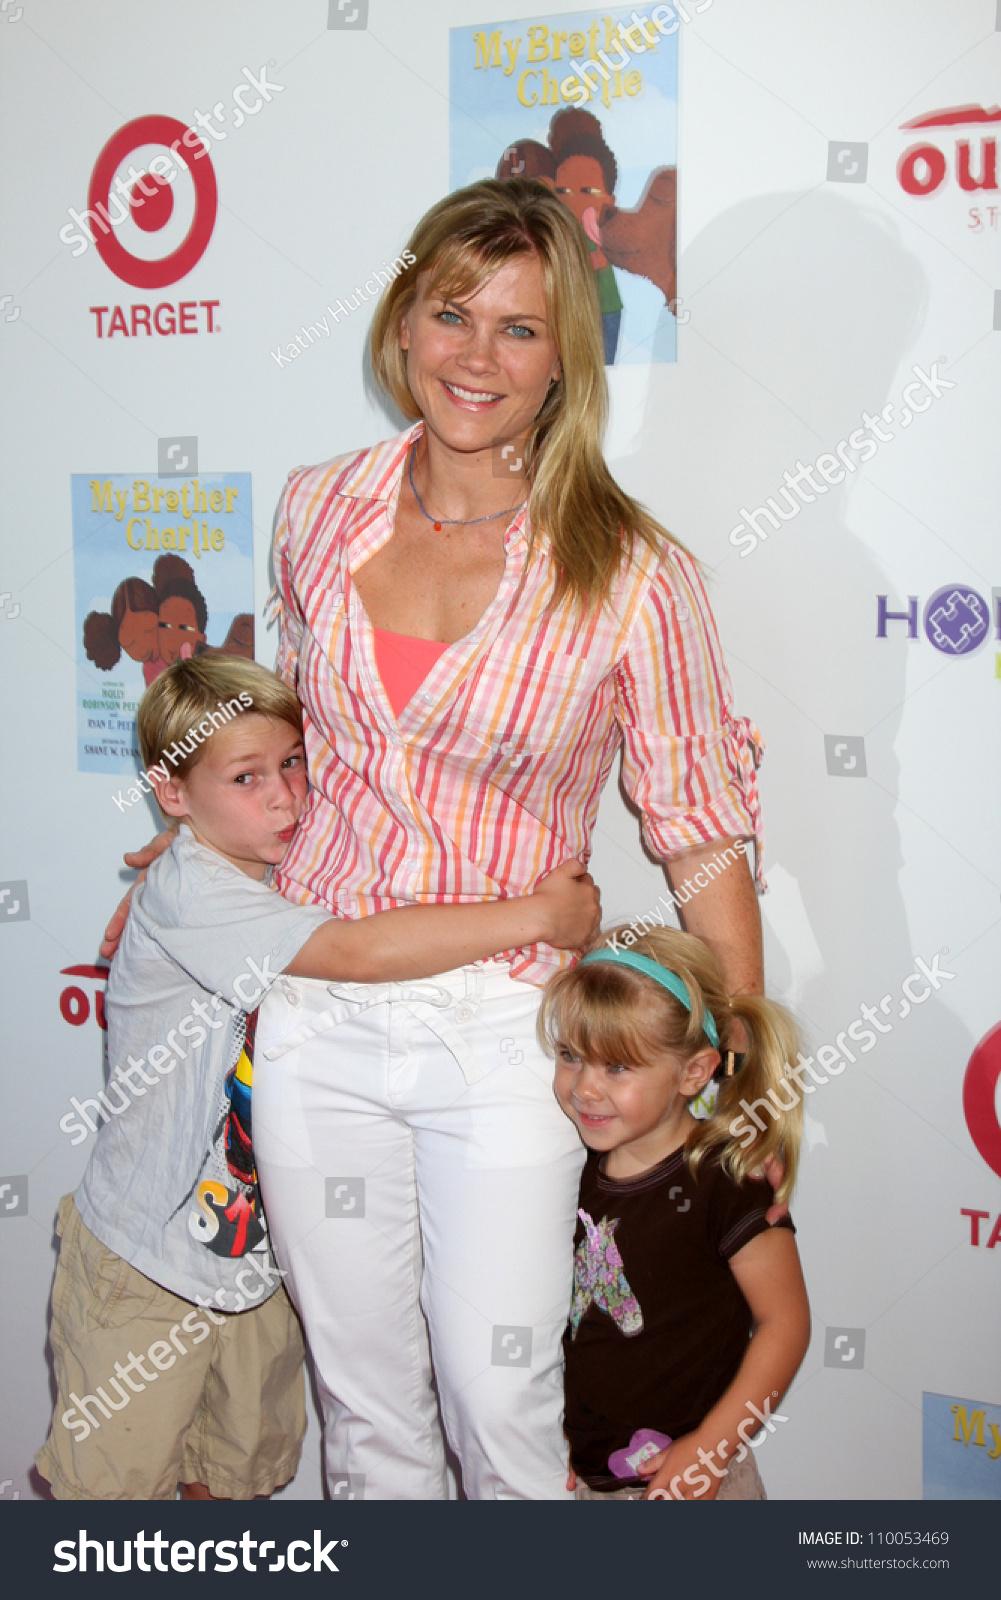 Alison Sweeney Family Pictures los angeles aug 12 alison sweeney stock photo (edit now